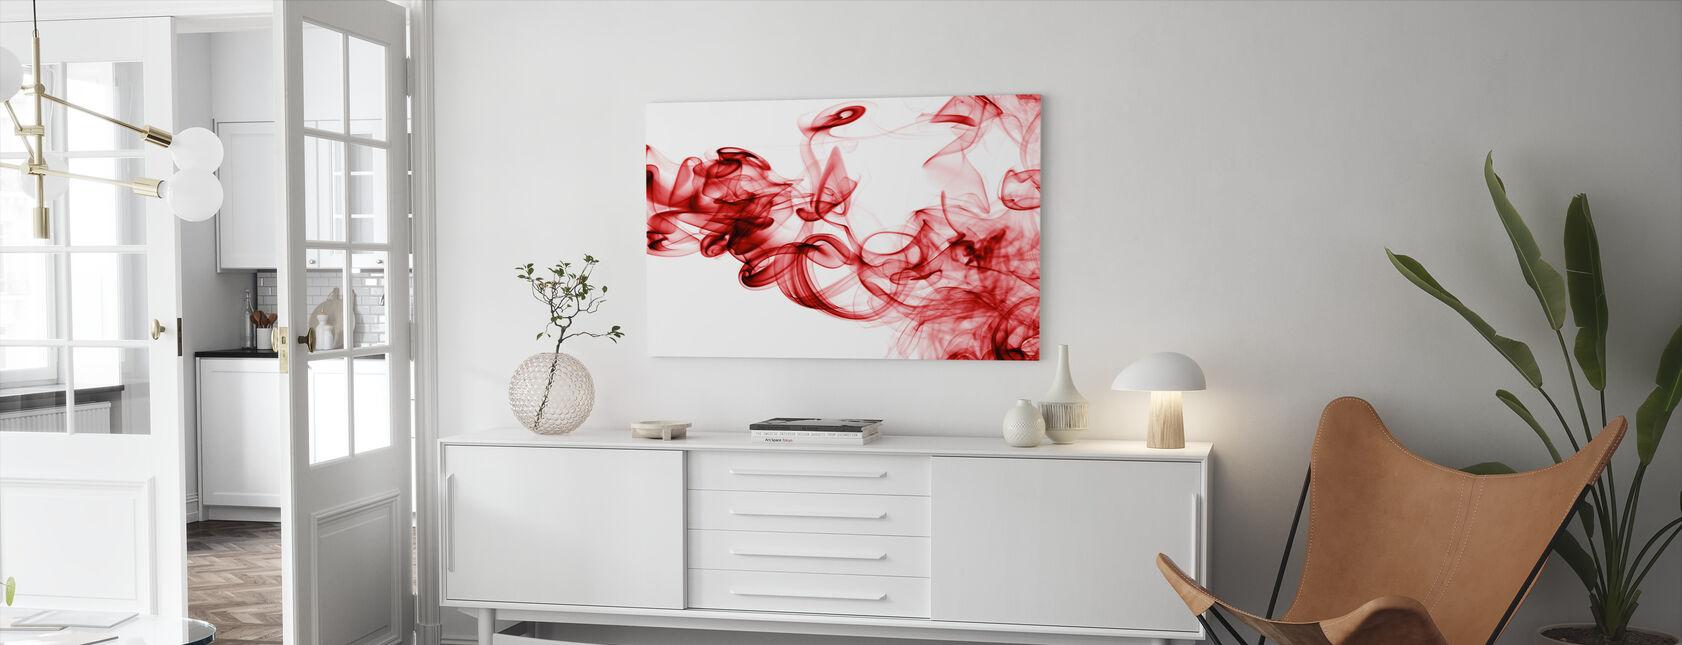 Roter Rauch - Leinwandbild - Wohnzimmer